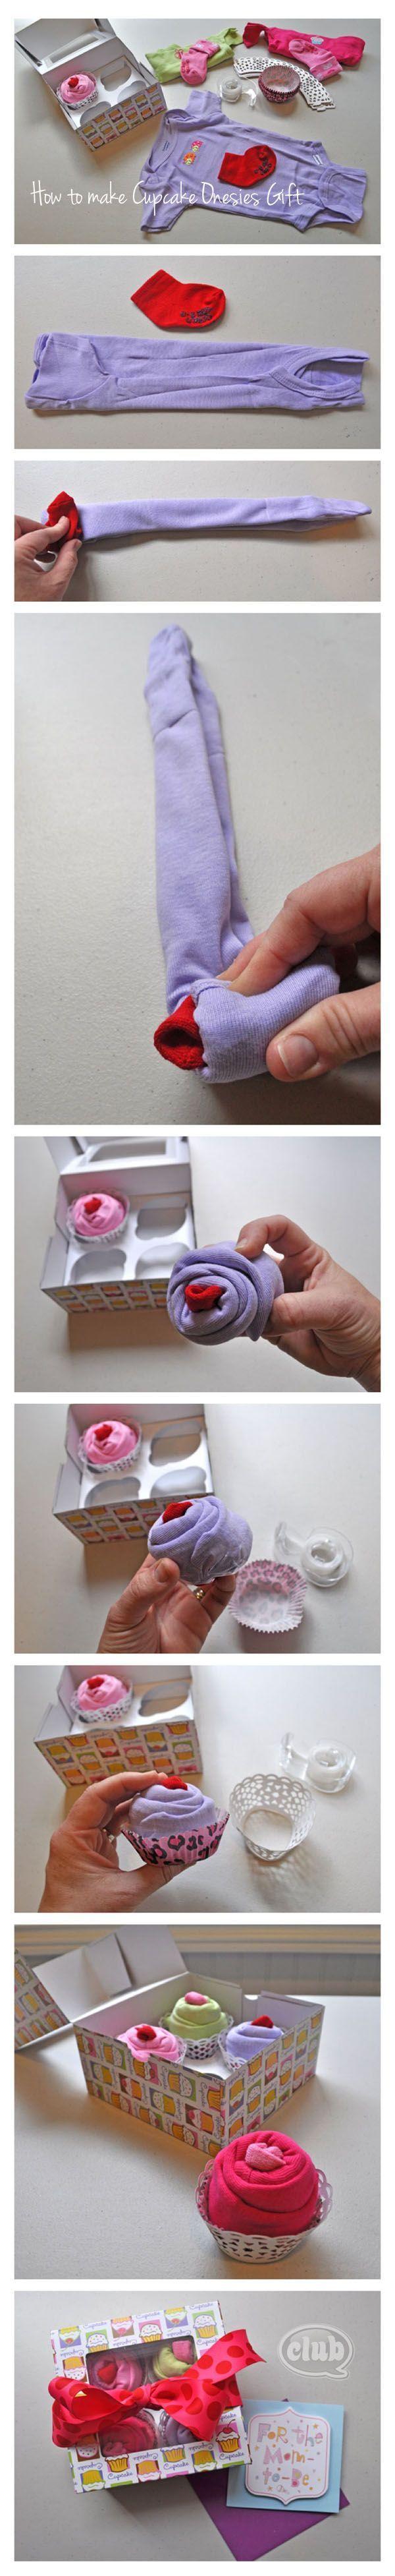 Cupcake onesies baby gift - perfect homemade gift idea so cute